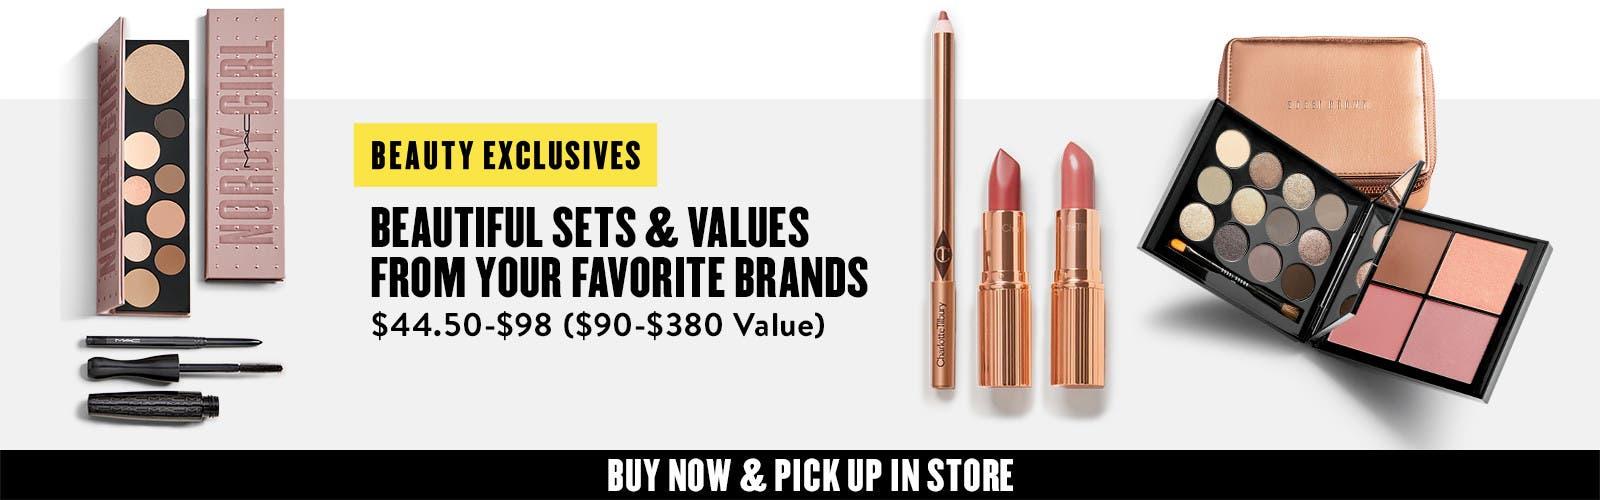 Anniversary makeup exclusives.